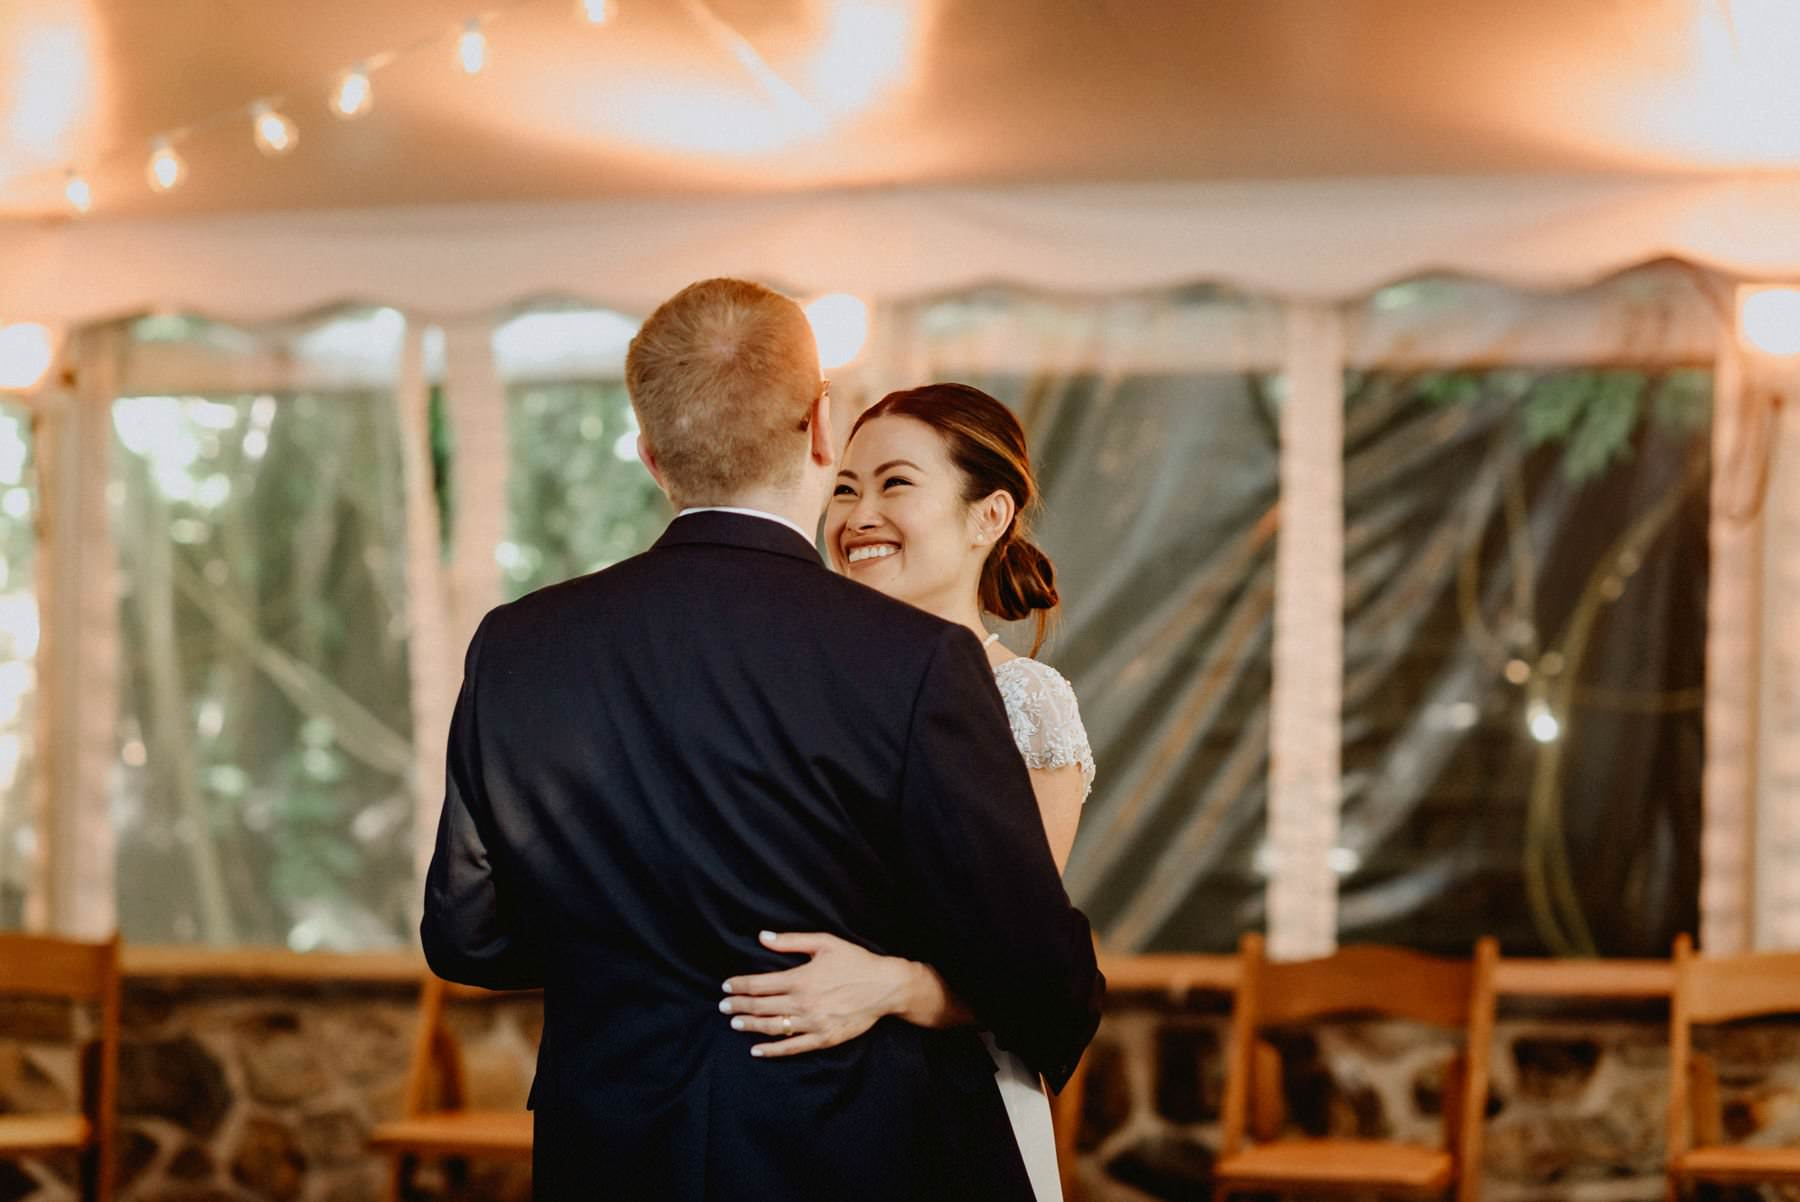 Appleford-estate-wedding-117.jpg